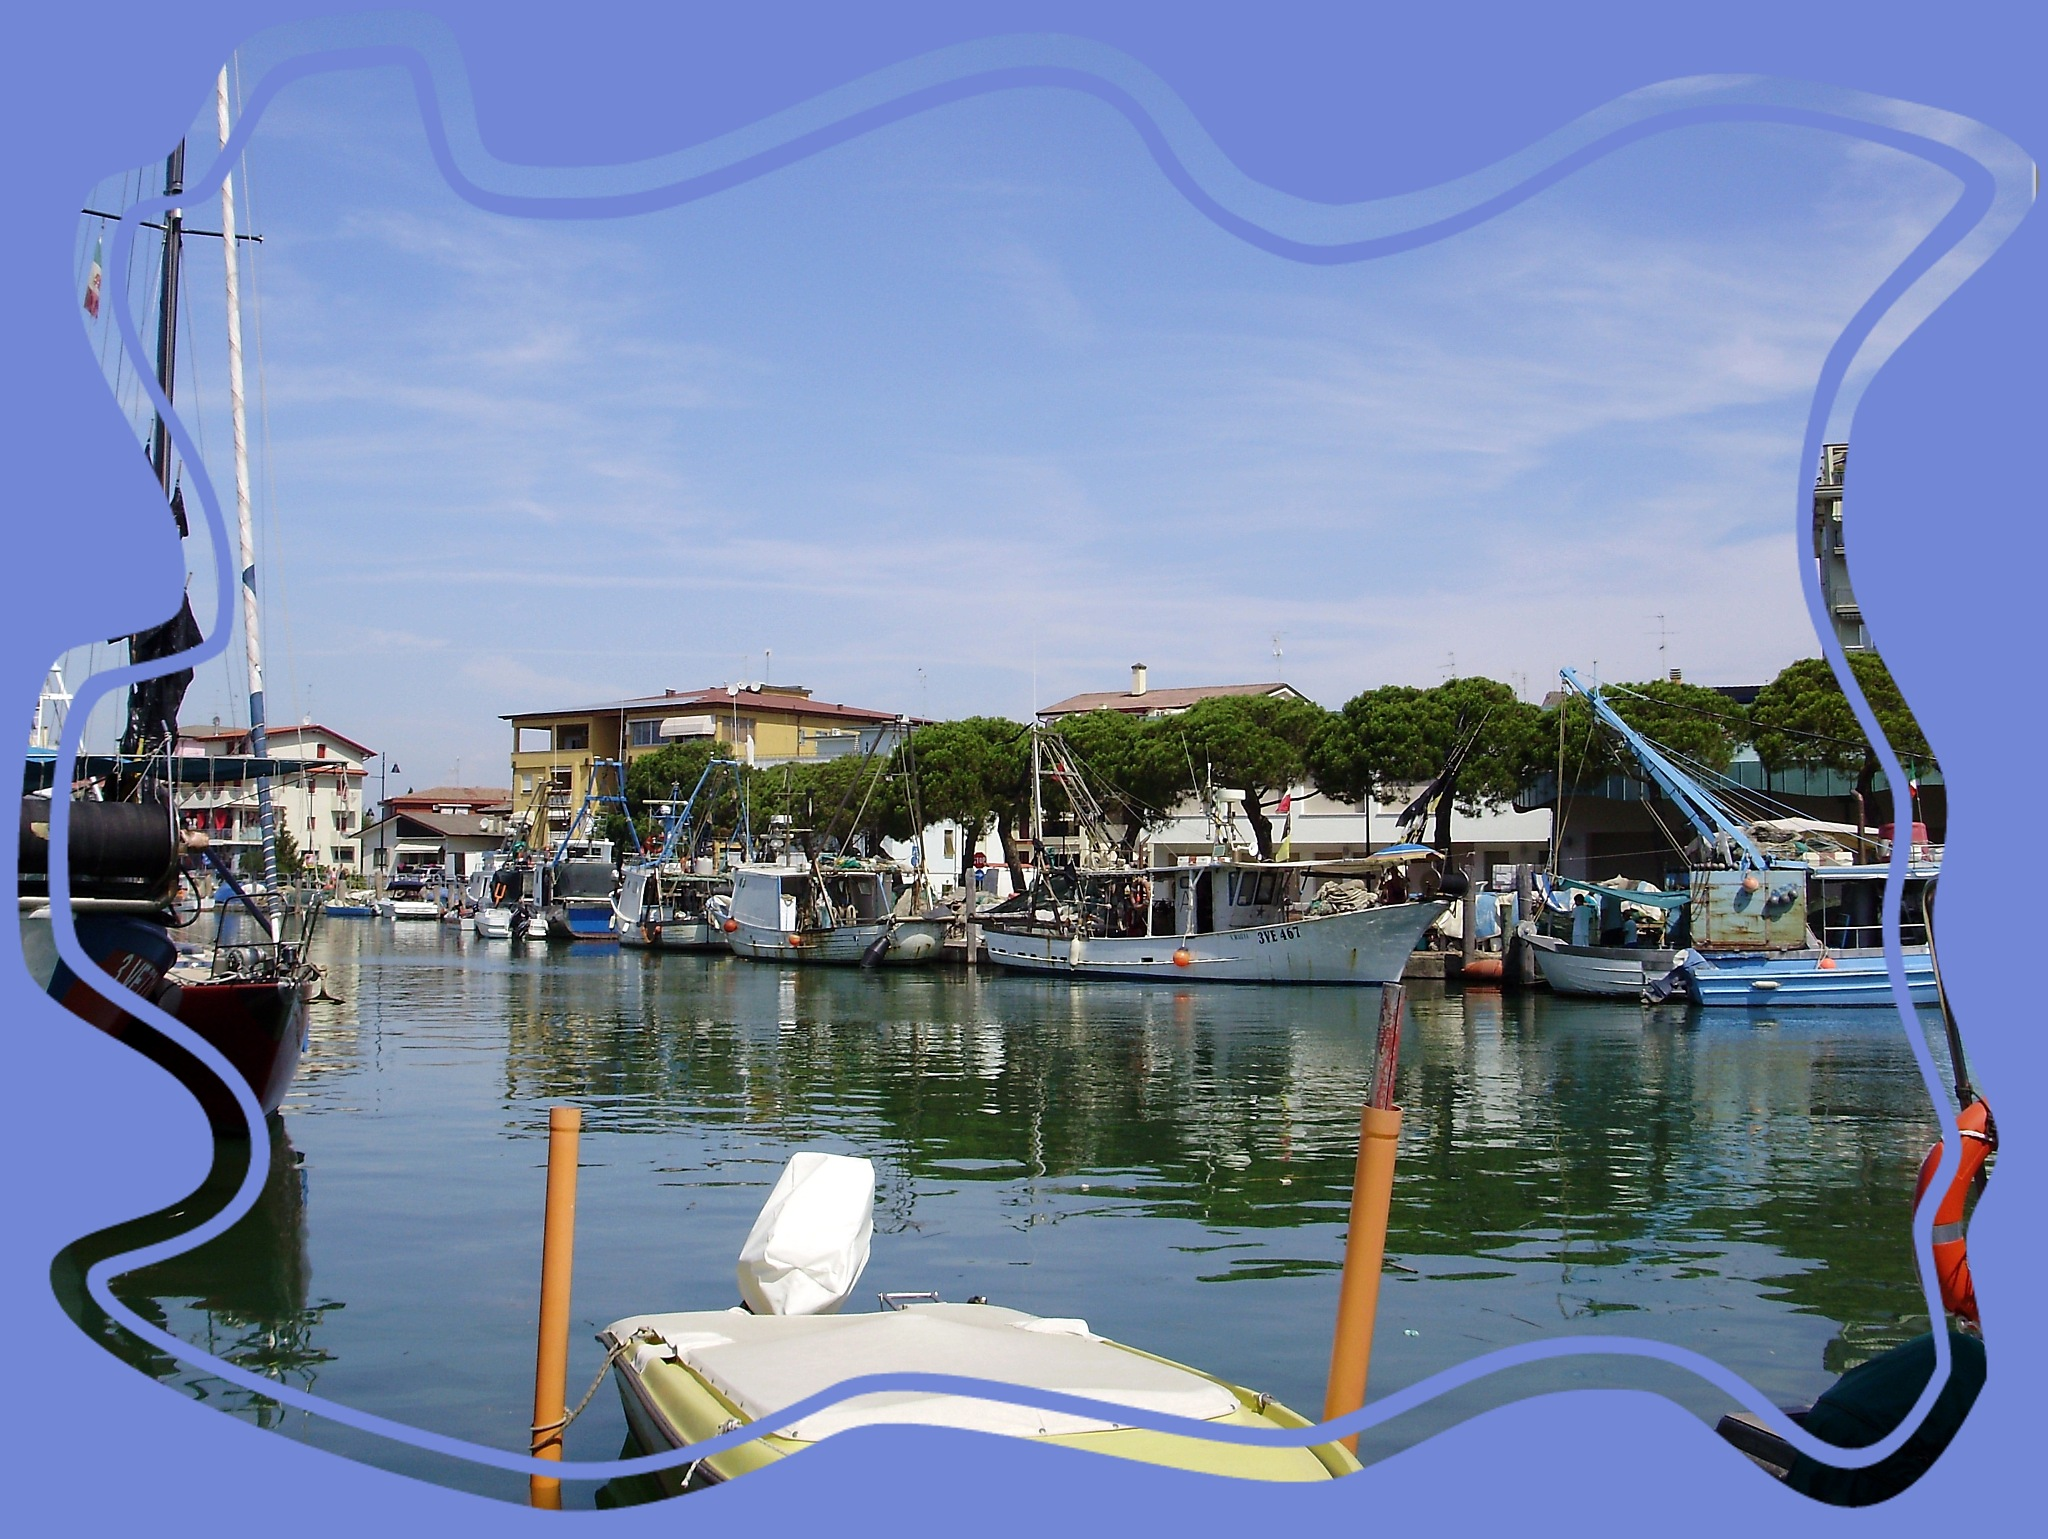 Porto di Caorle  by Imre Lakat